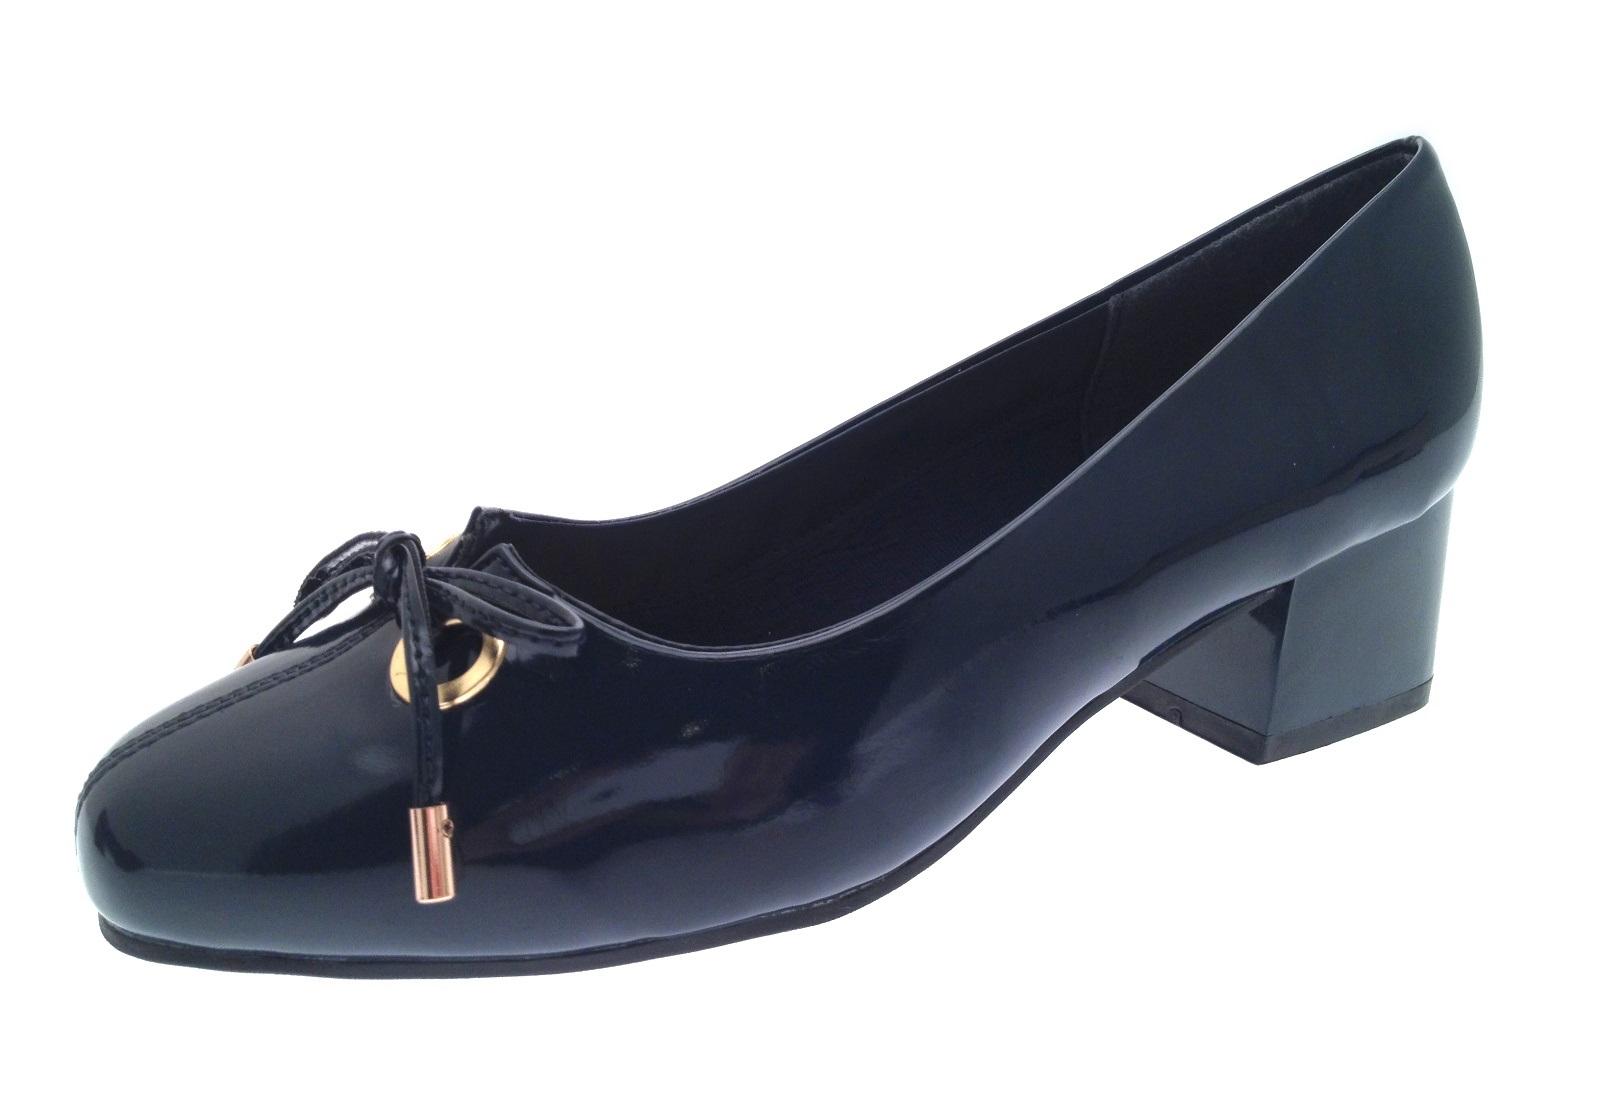 Extra Wide Womens Ballroom Dance Shoes